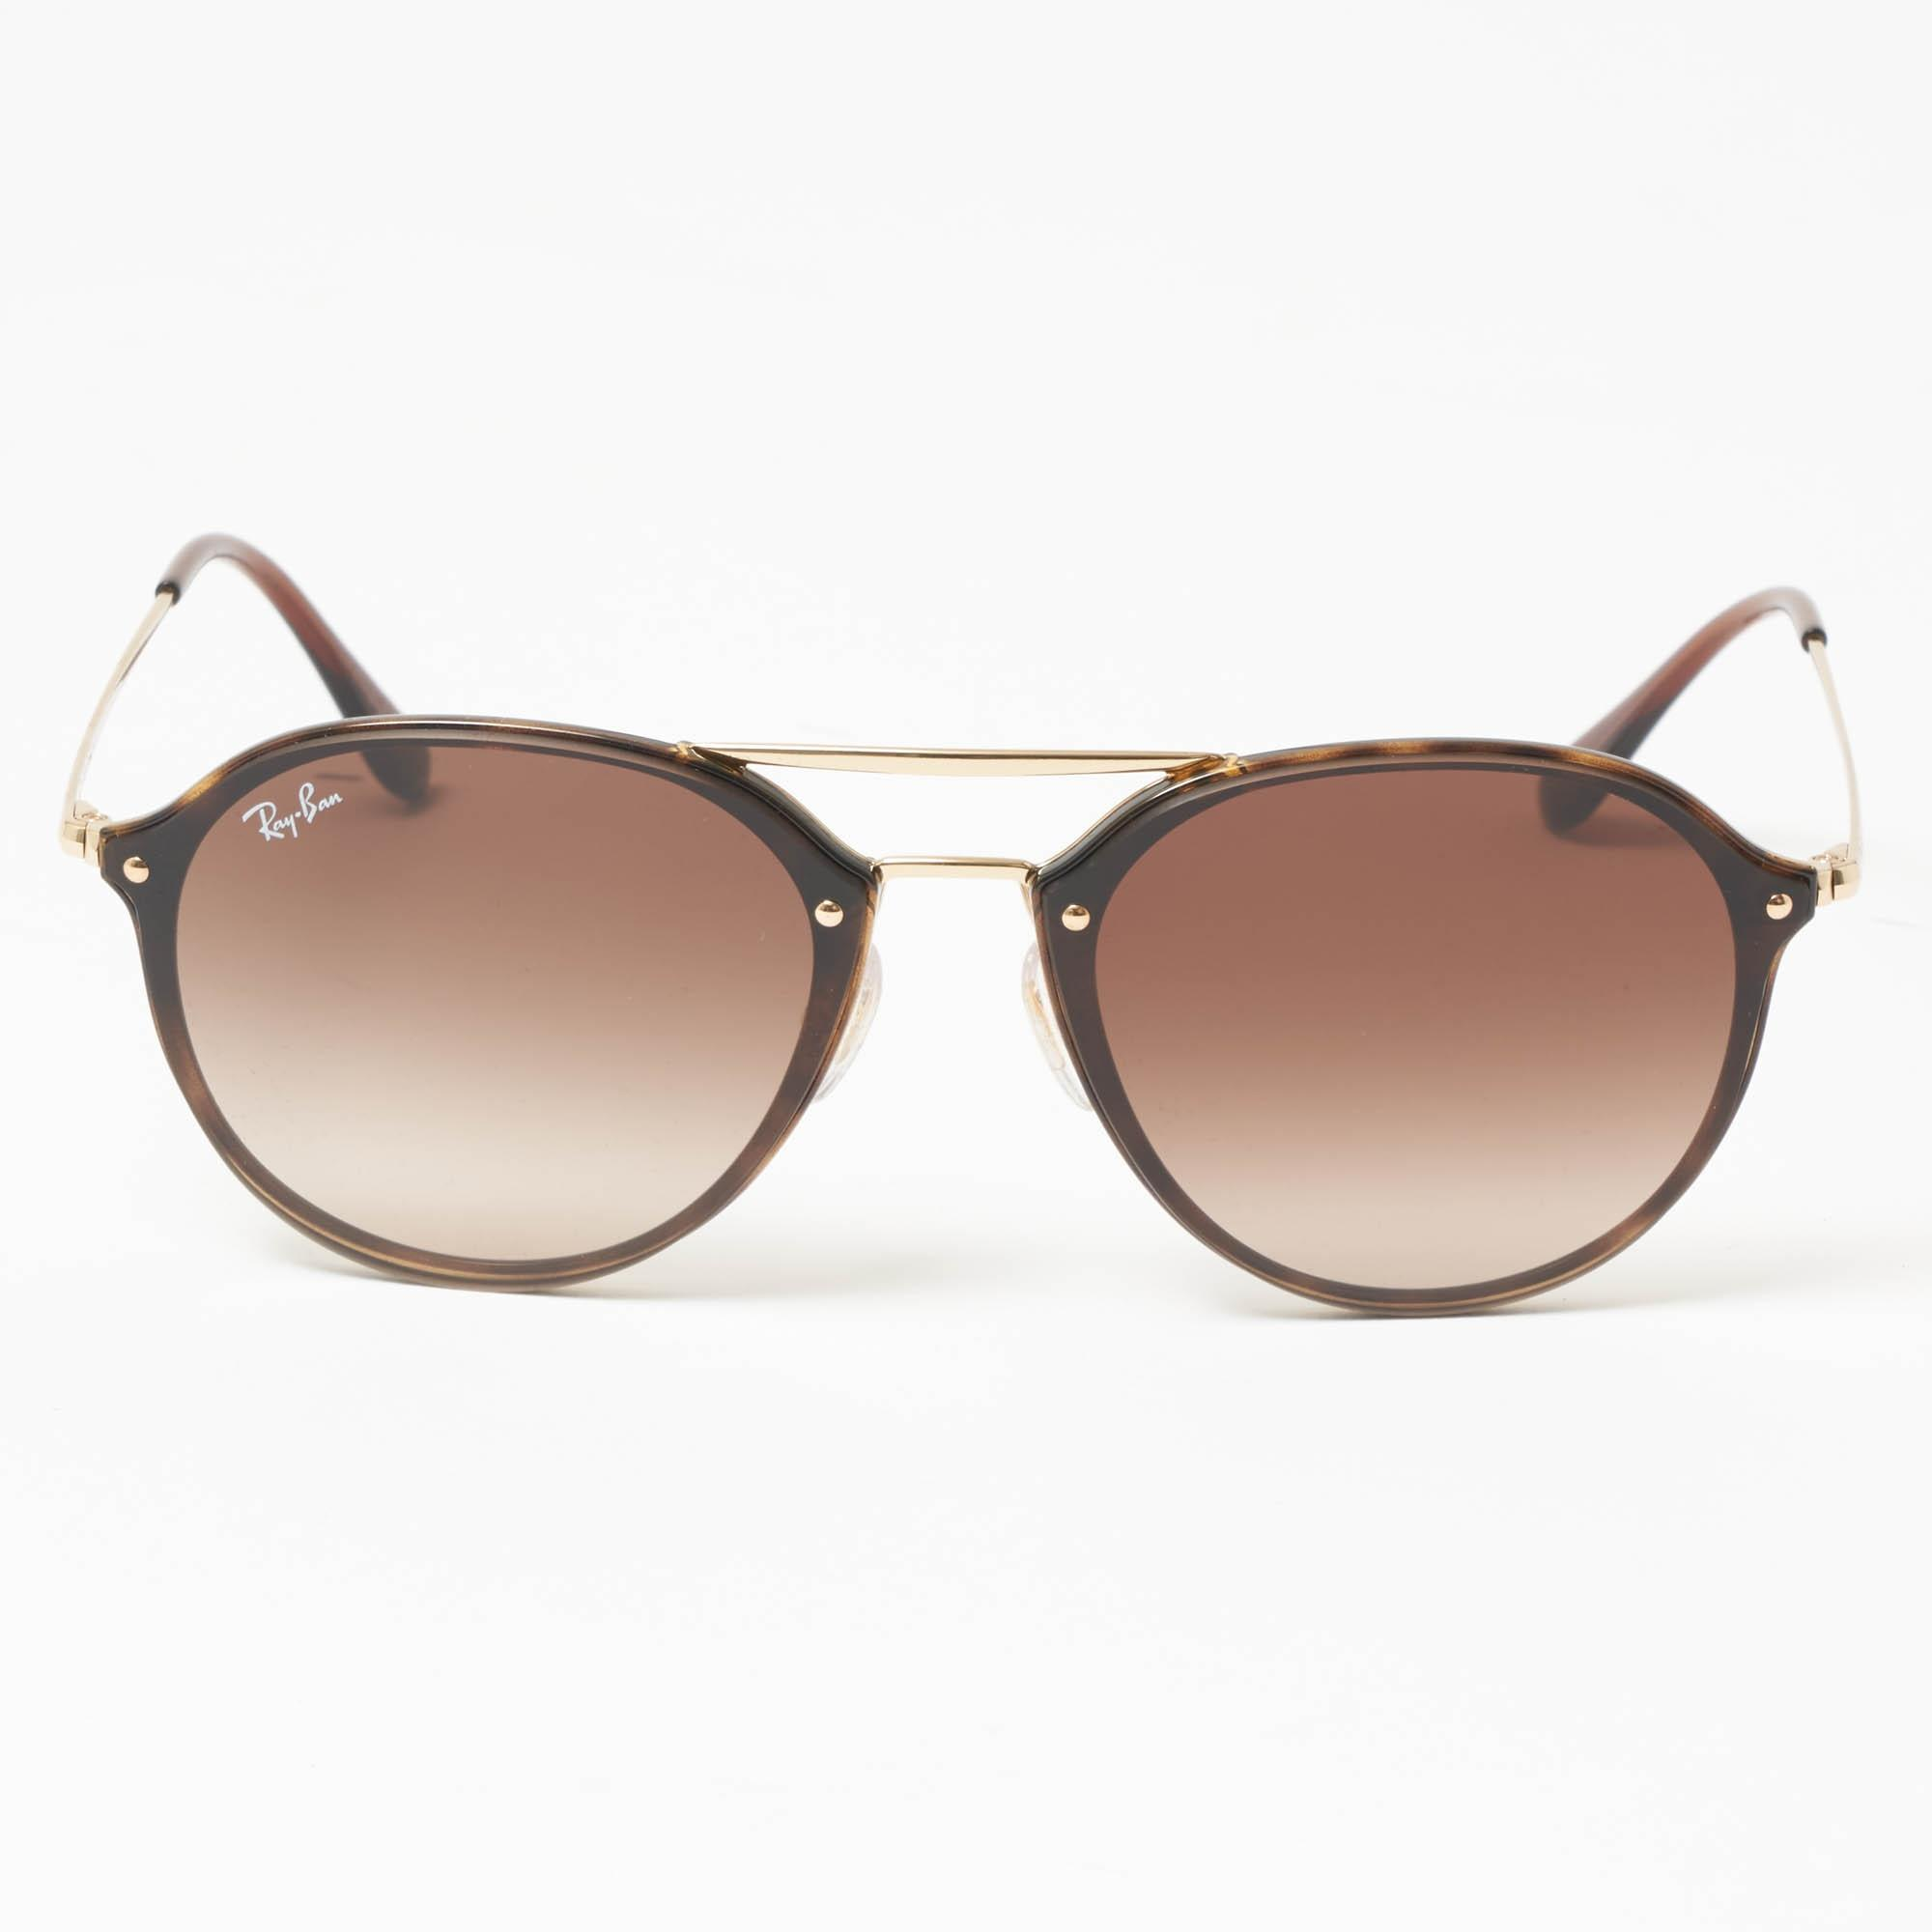 e0ccd7b9f7 Ray-Ban - Blaze Double Bridge Sunglasses - Brown Gradient Lenses - Lyst.  View fullscreen